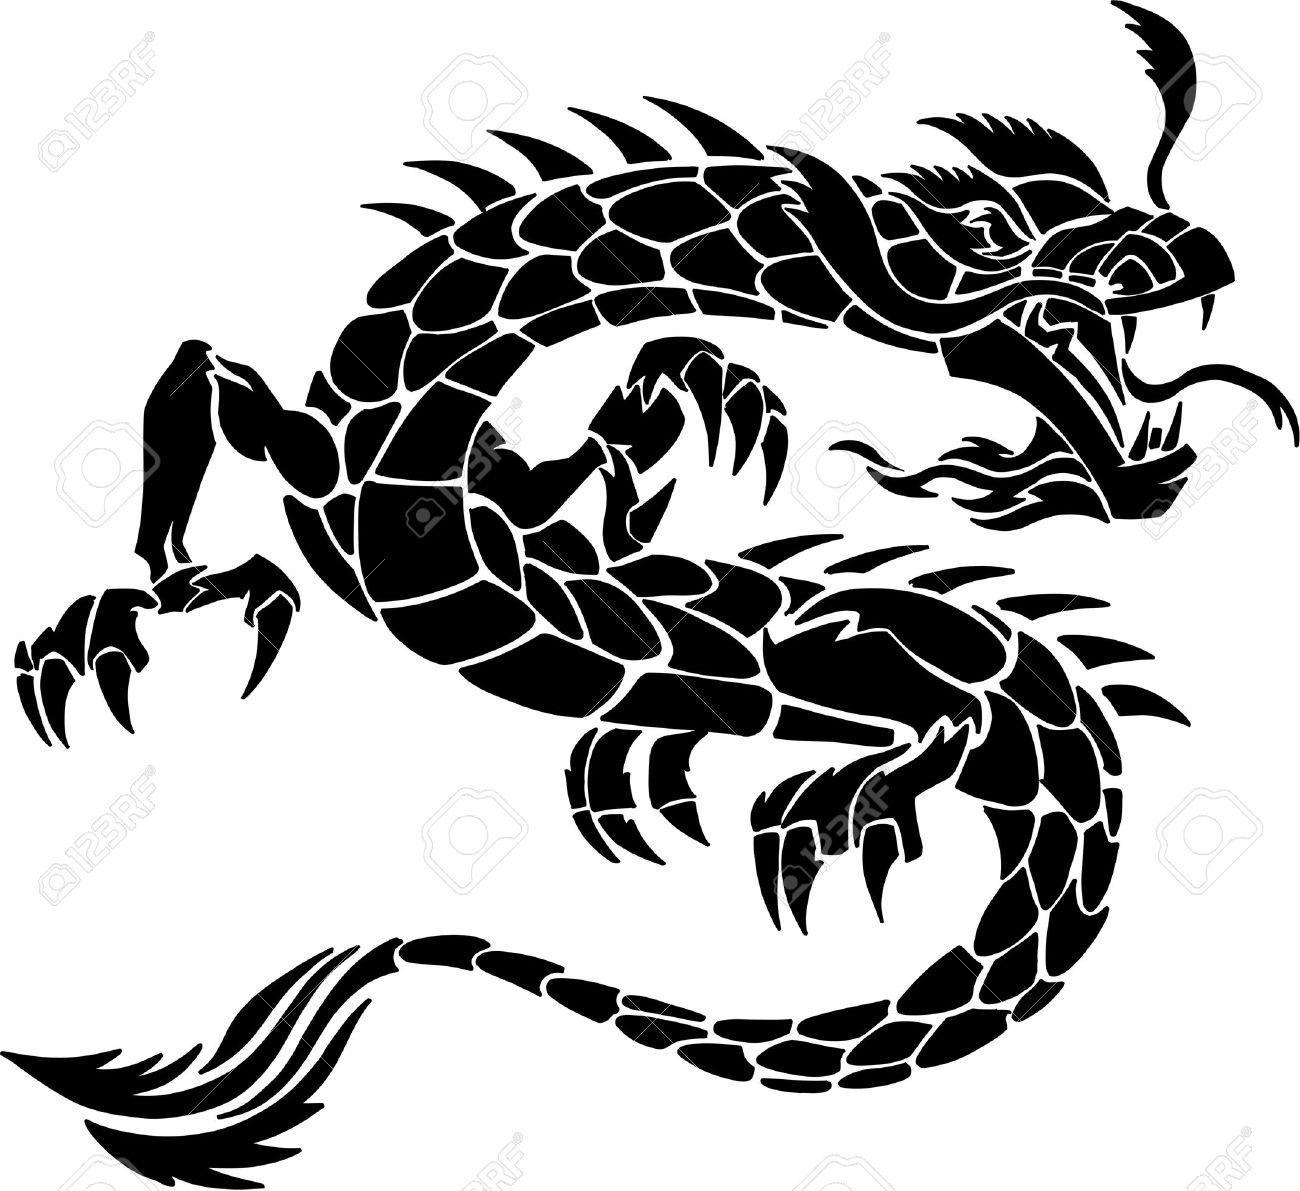 tribal tattoo dragon vector illustration royalty free cliparts rh 123rf com dragon vector free dragon vector freepik